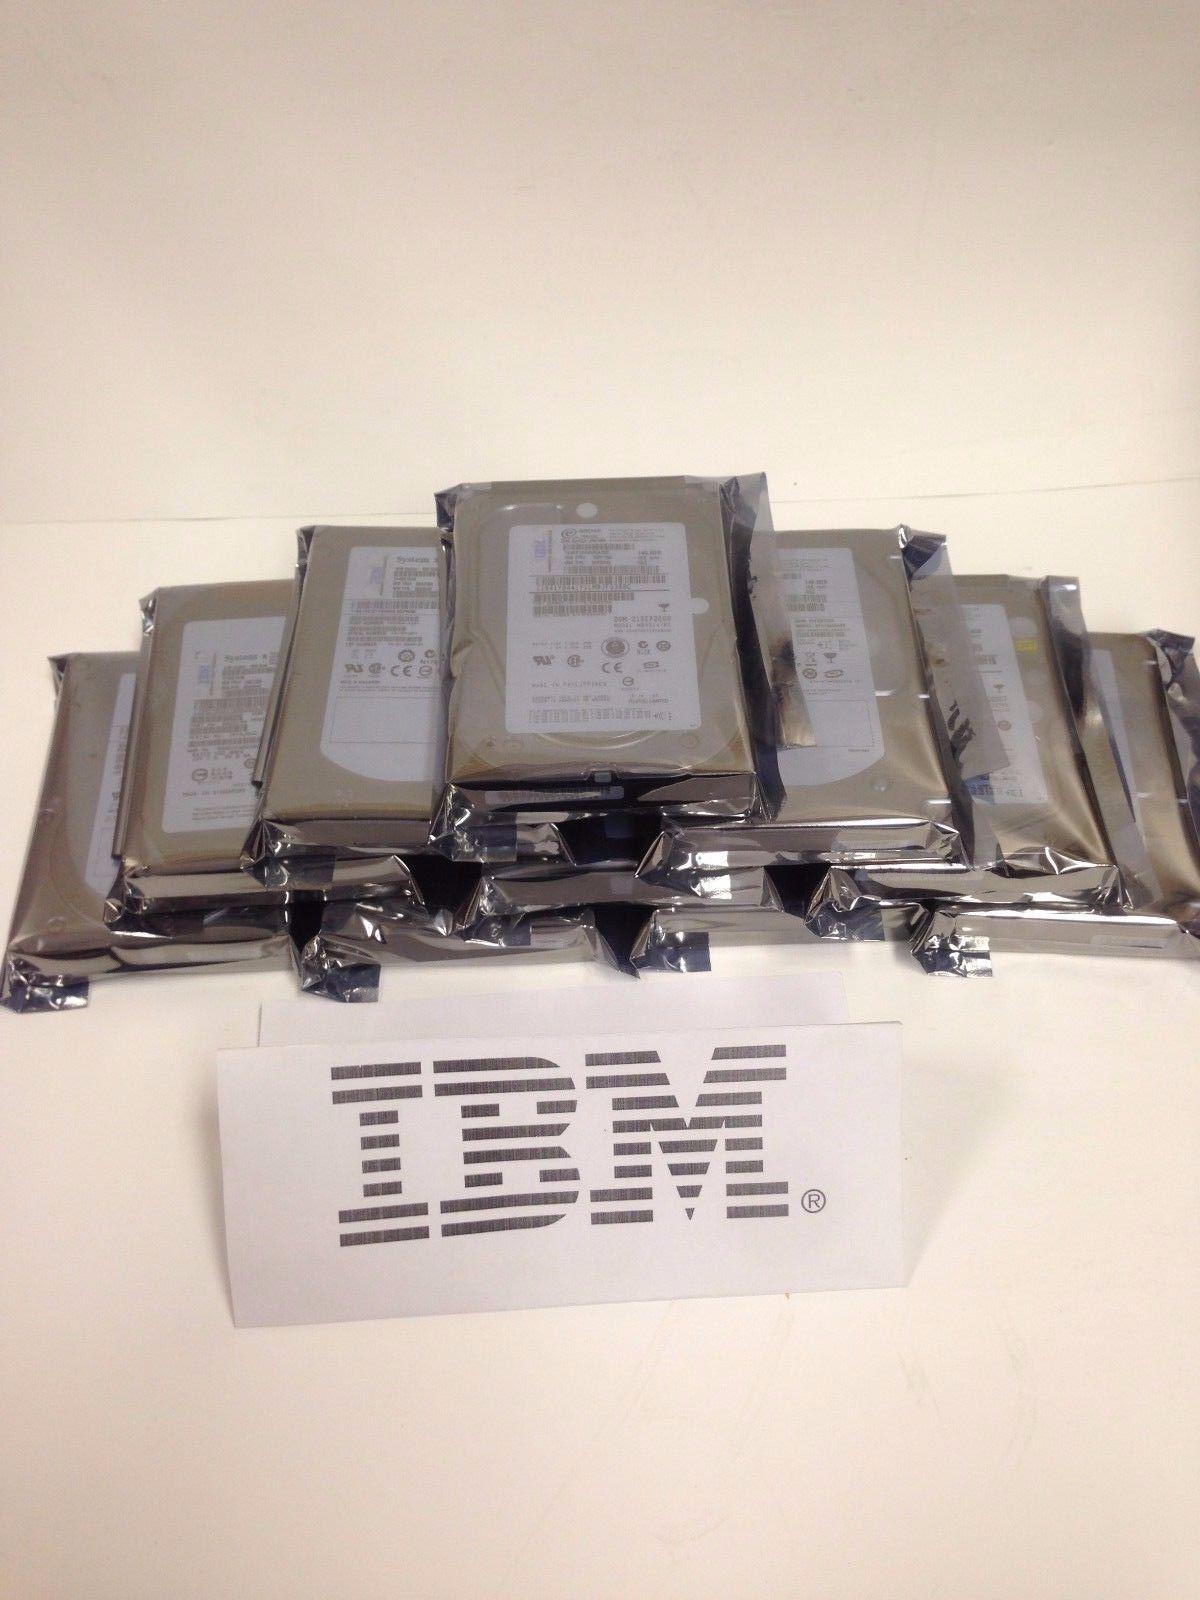 43W7482 43W7488 IBM 146GB 15K SAS 3.5 HARDDRIVE